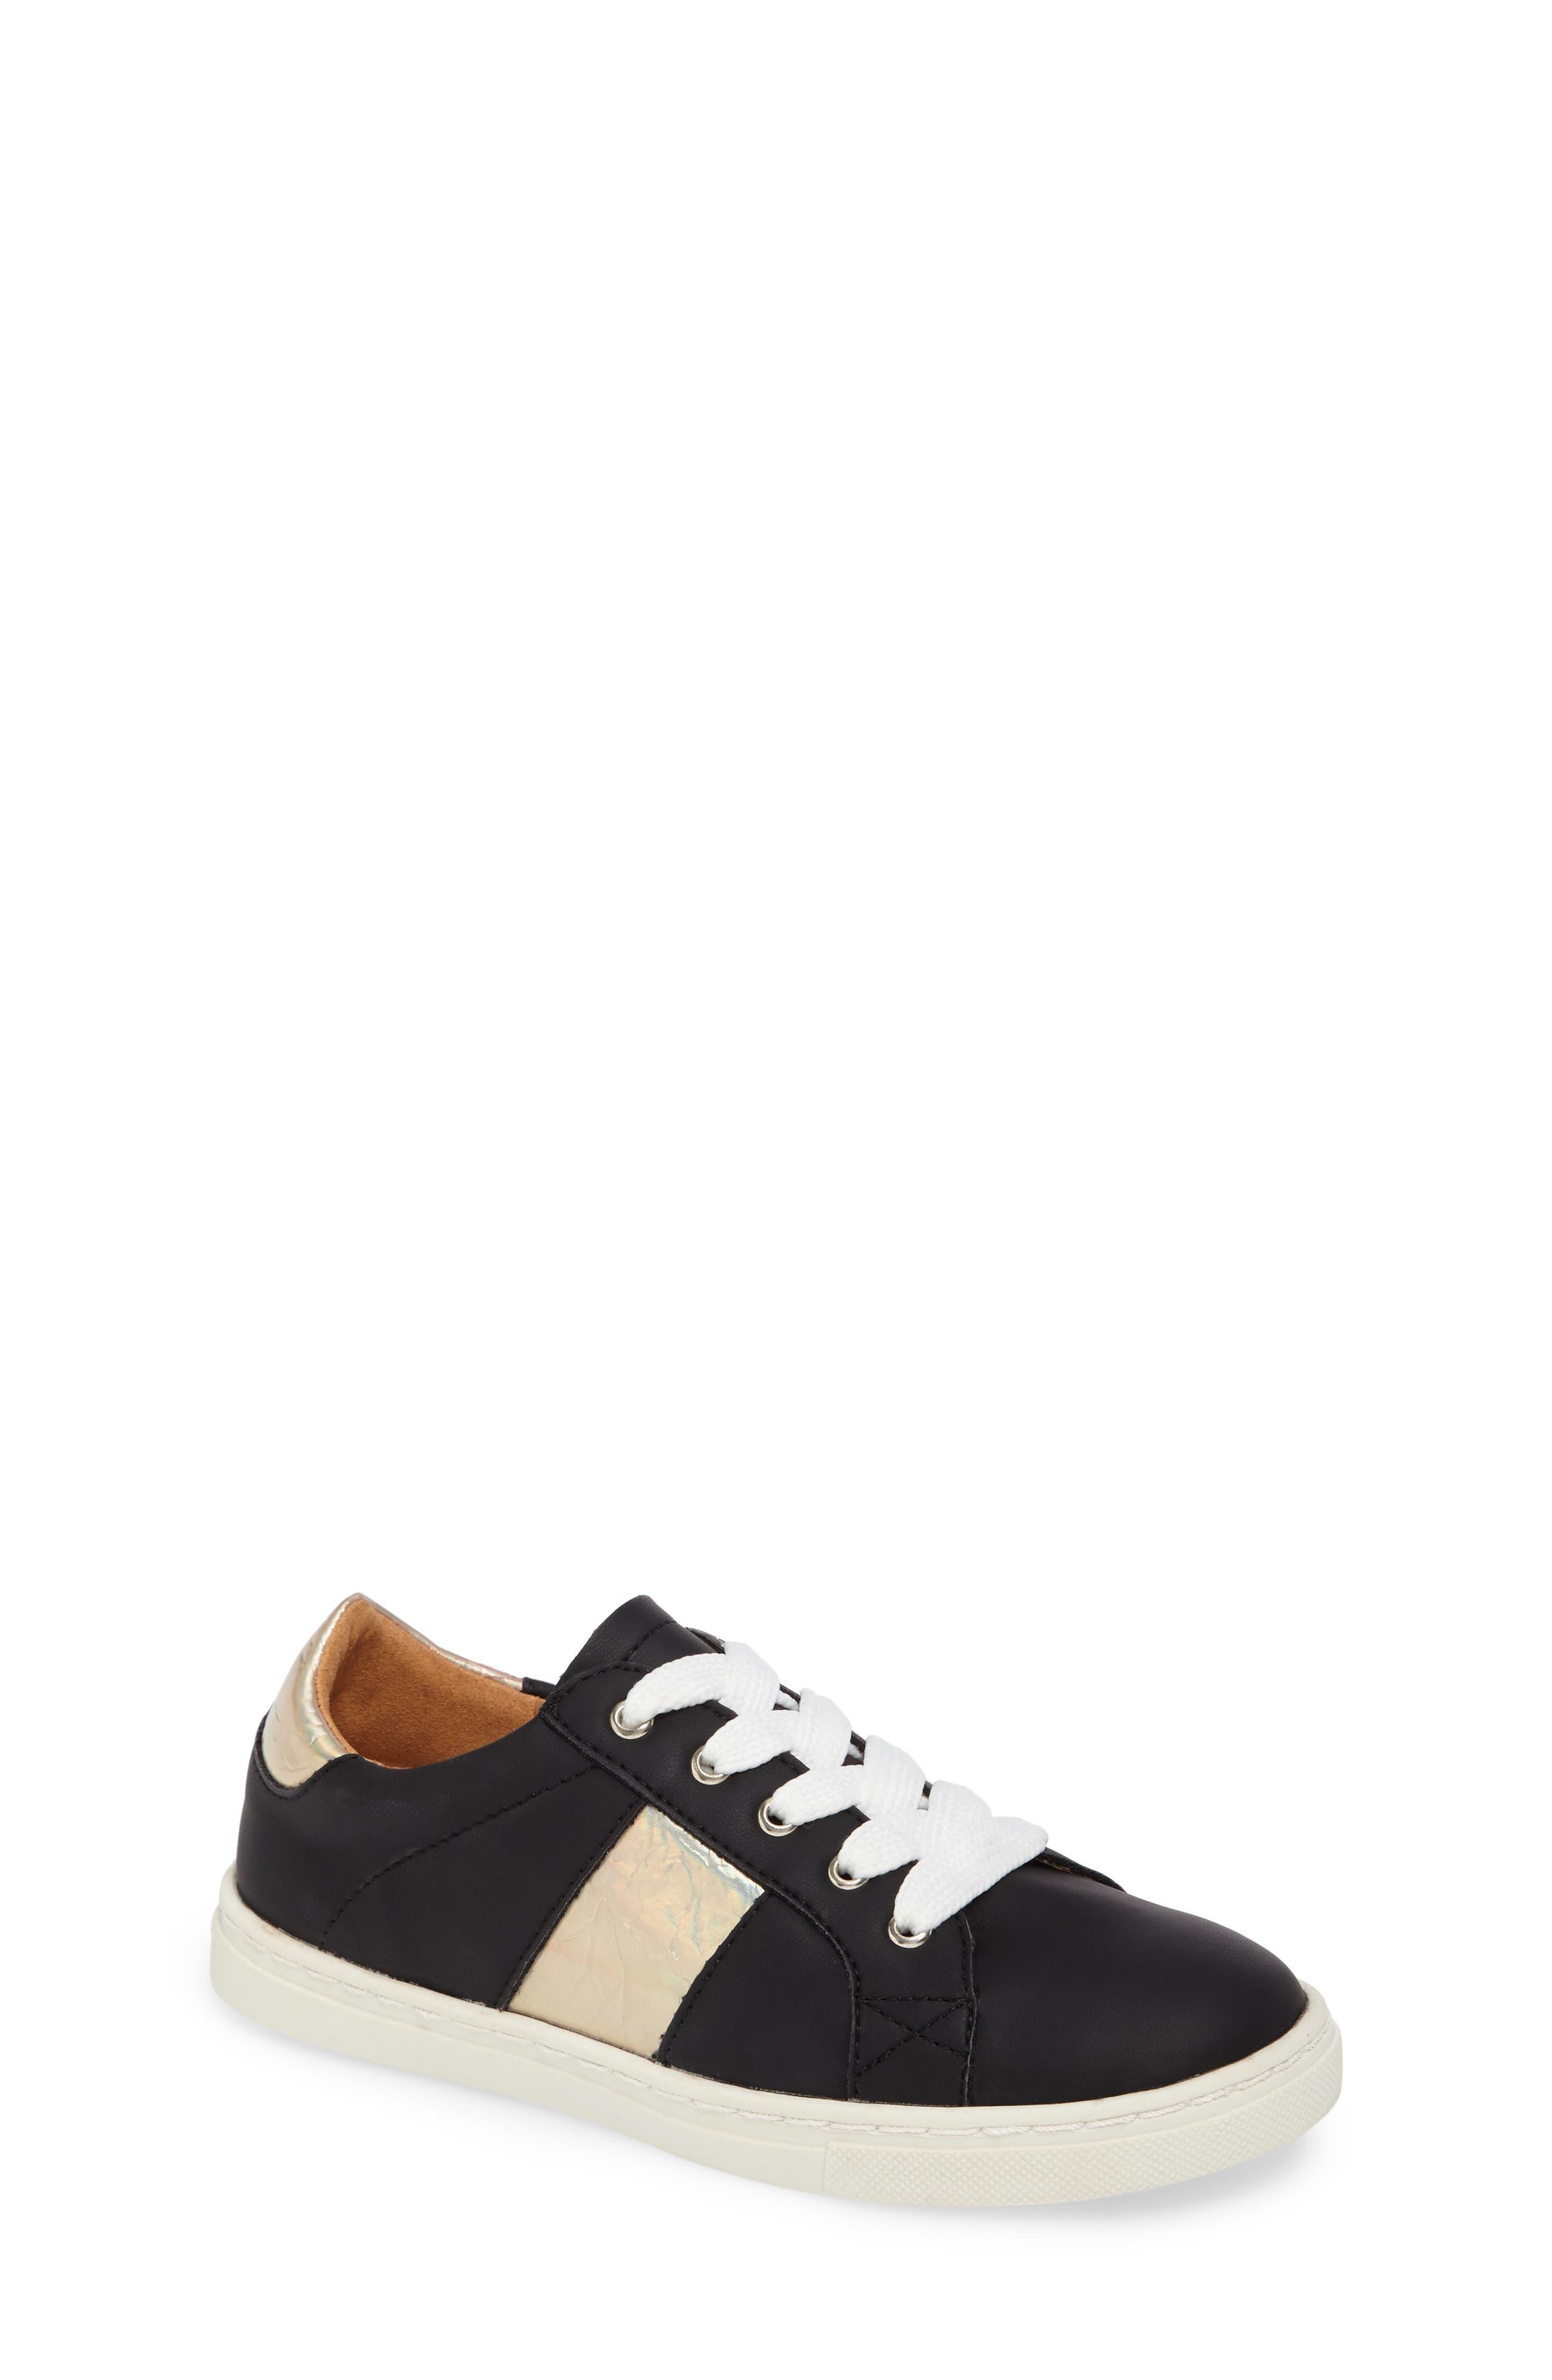 Ziggy Sneaker,                             Main thumbnail 1, color,                             001